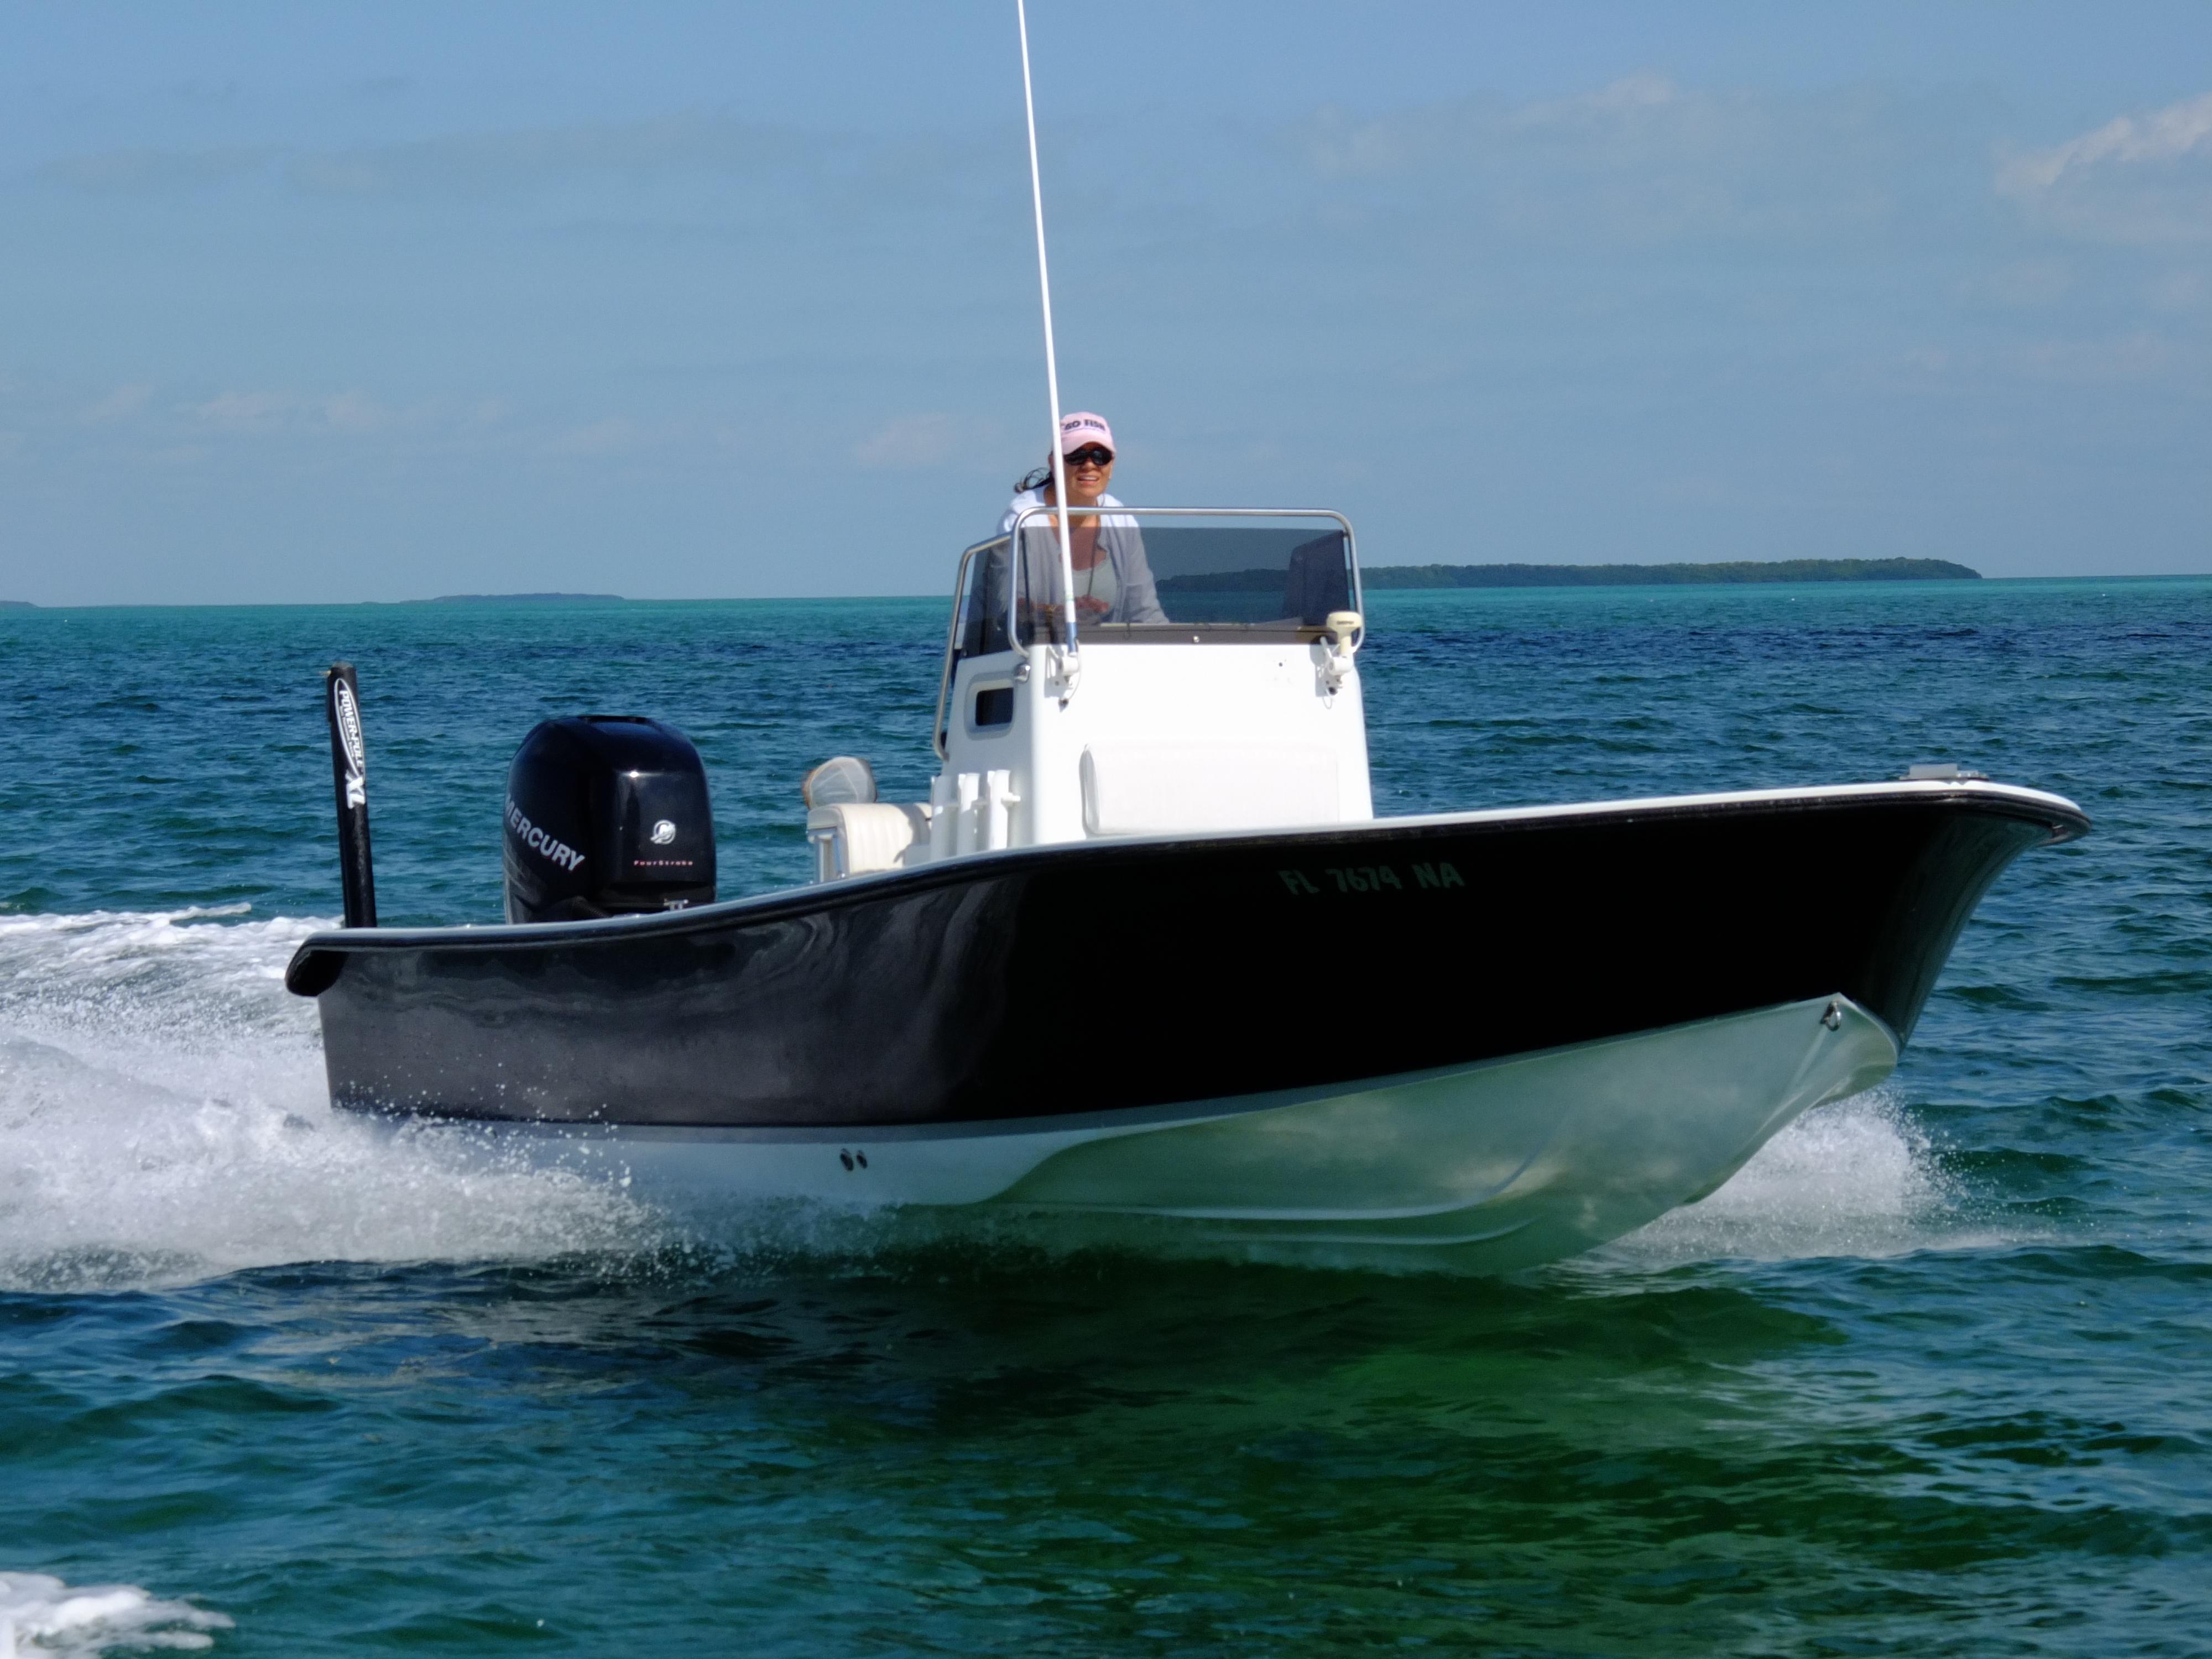 Florida keys fishing charters fishing charters for Florida keys fishing charters